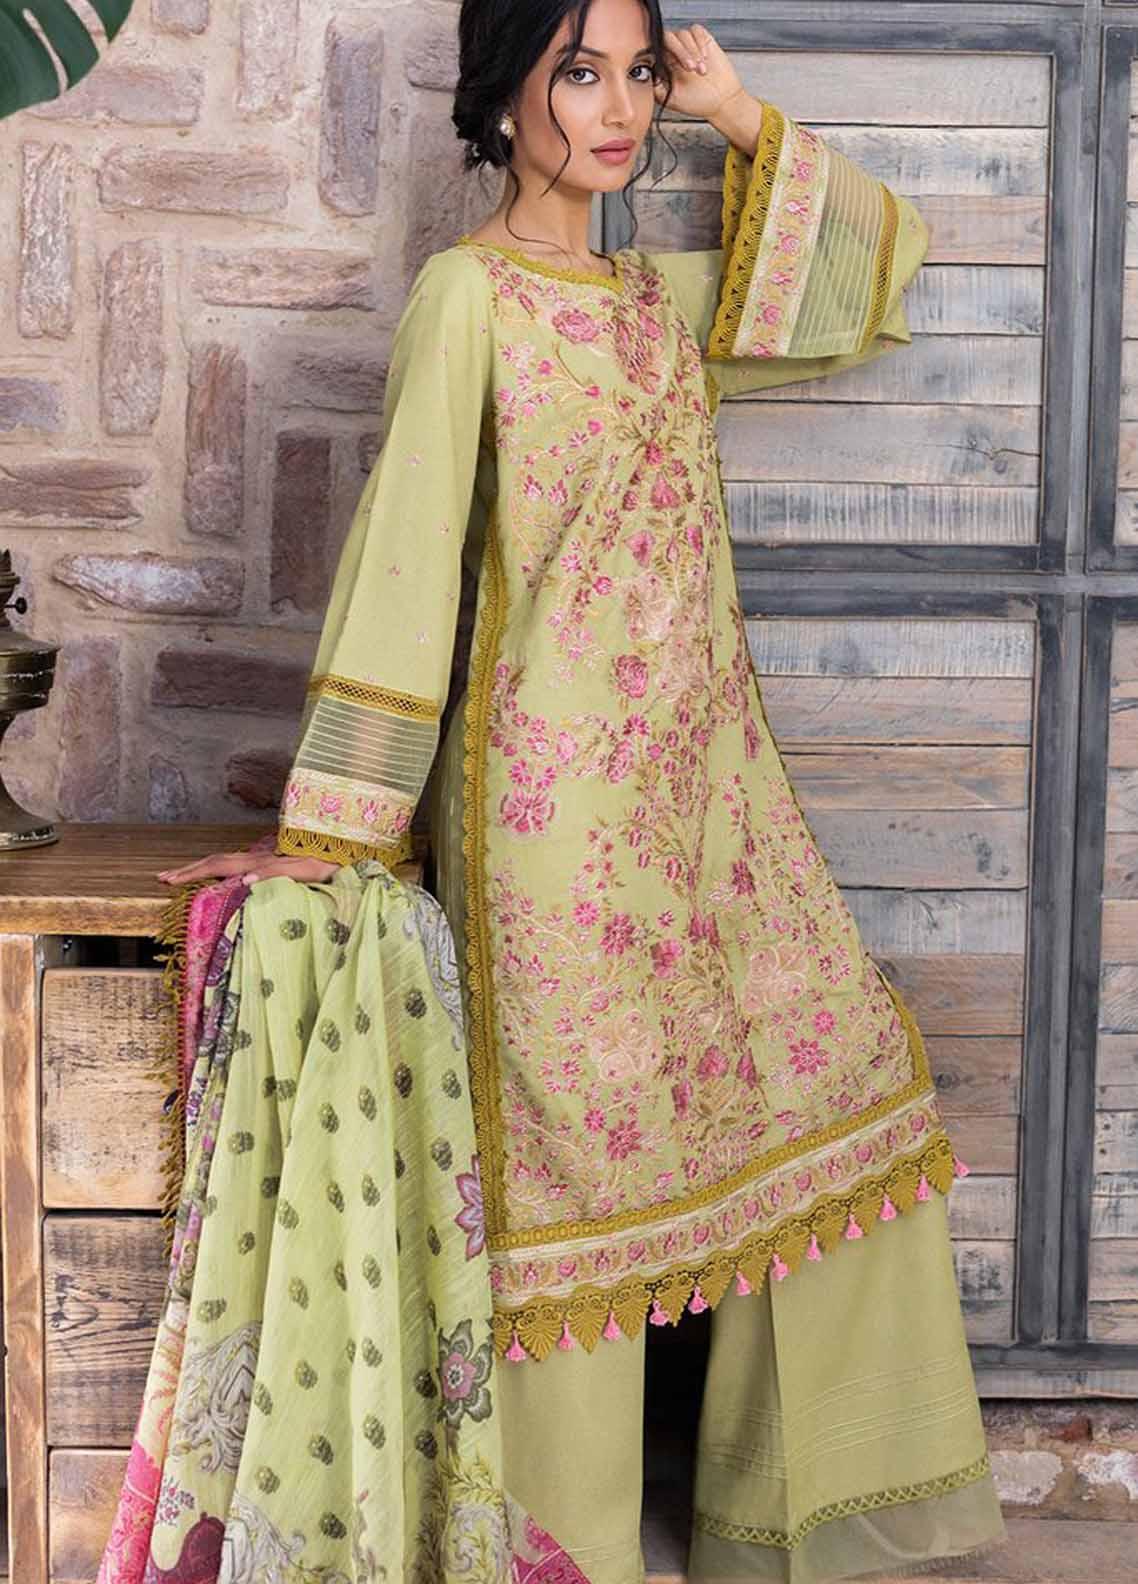 Sobia Nazir Embroidered Silk Karandi Suit Unstitched 3 Piece 02B – Autumn/Winter Collection